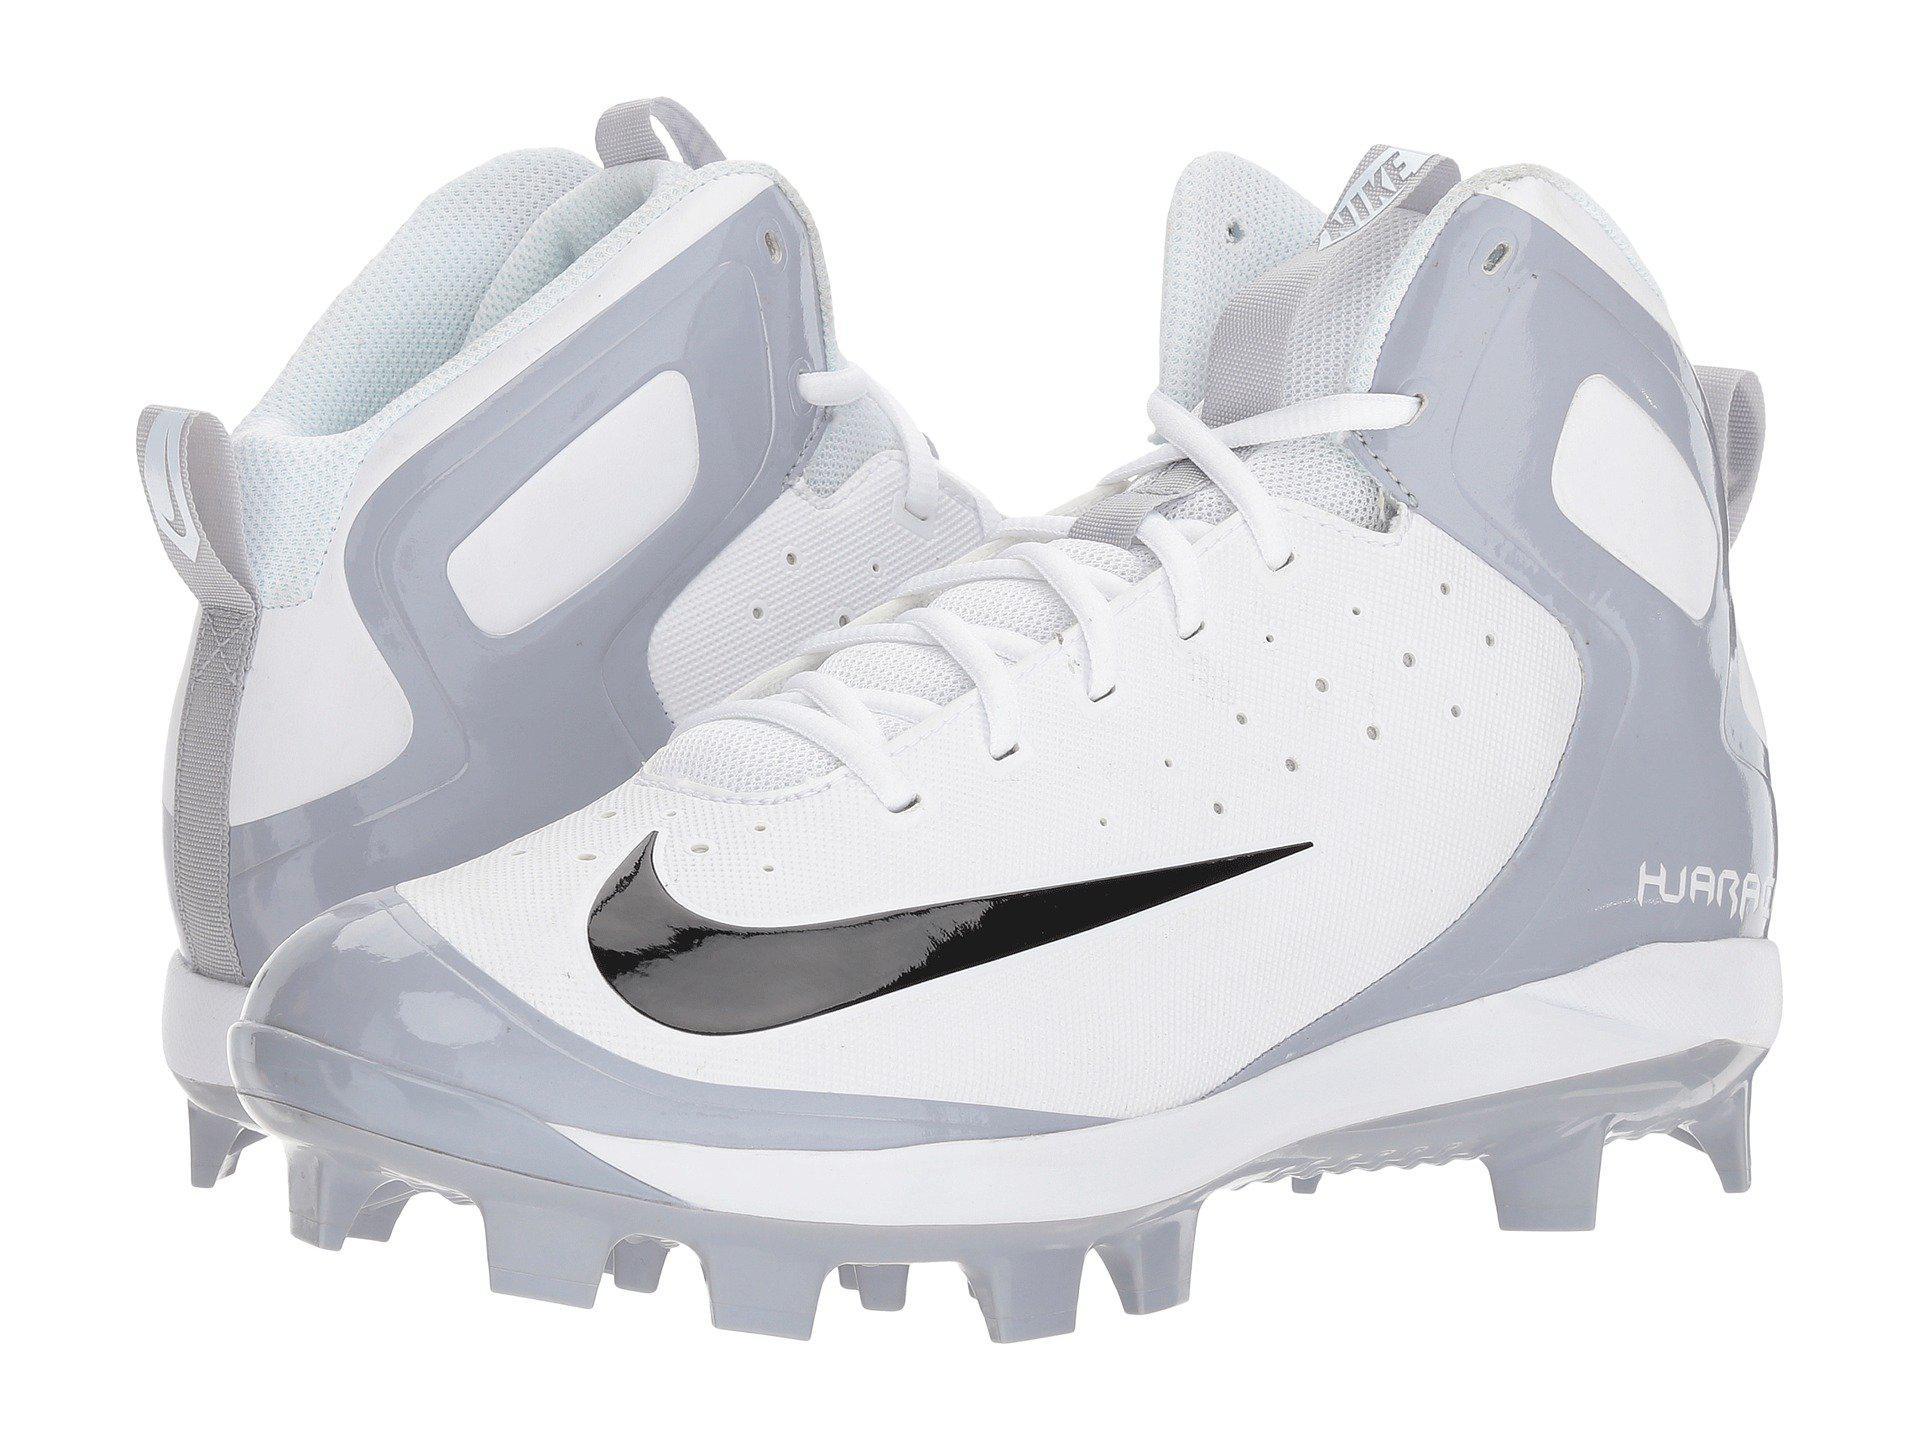 848bd186d296 Lyst - Nike Alpha Huarache Pro Mid Mcs in White for Men